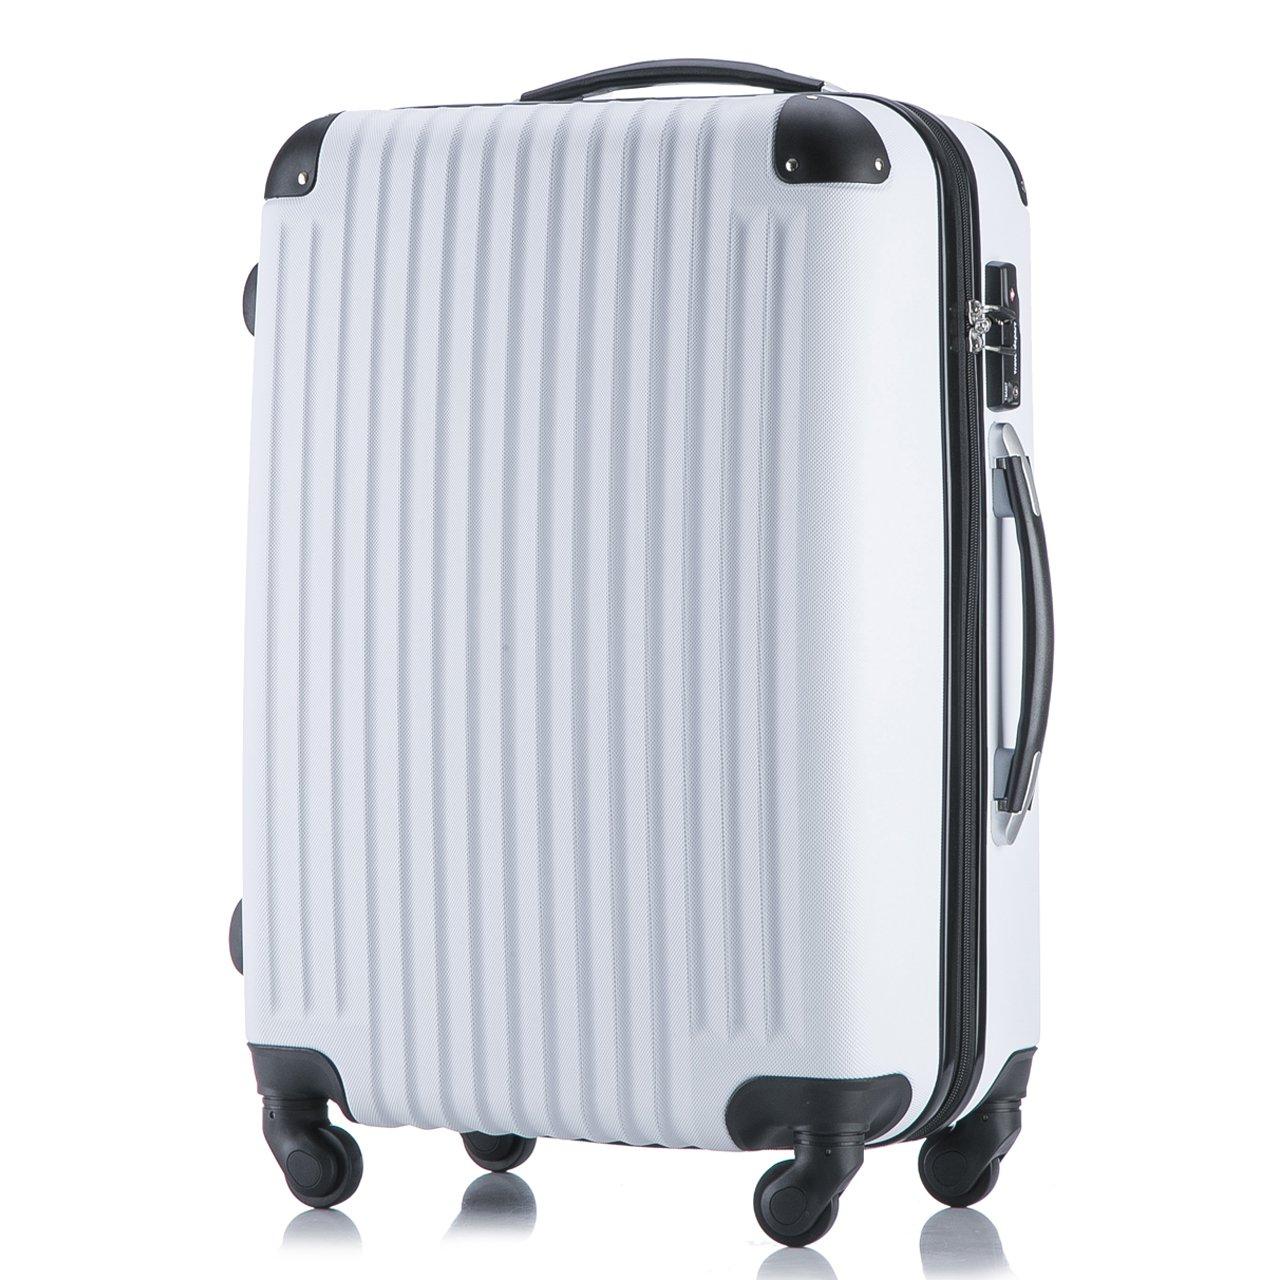 378f883c8f (トラベルデパート) 安心の3年保証 超軽量スーツケース TSAロック搭載 機内持込み ファスナータイプ ダイヤル式 保管カバー付